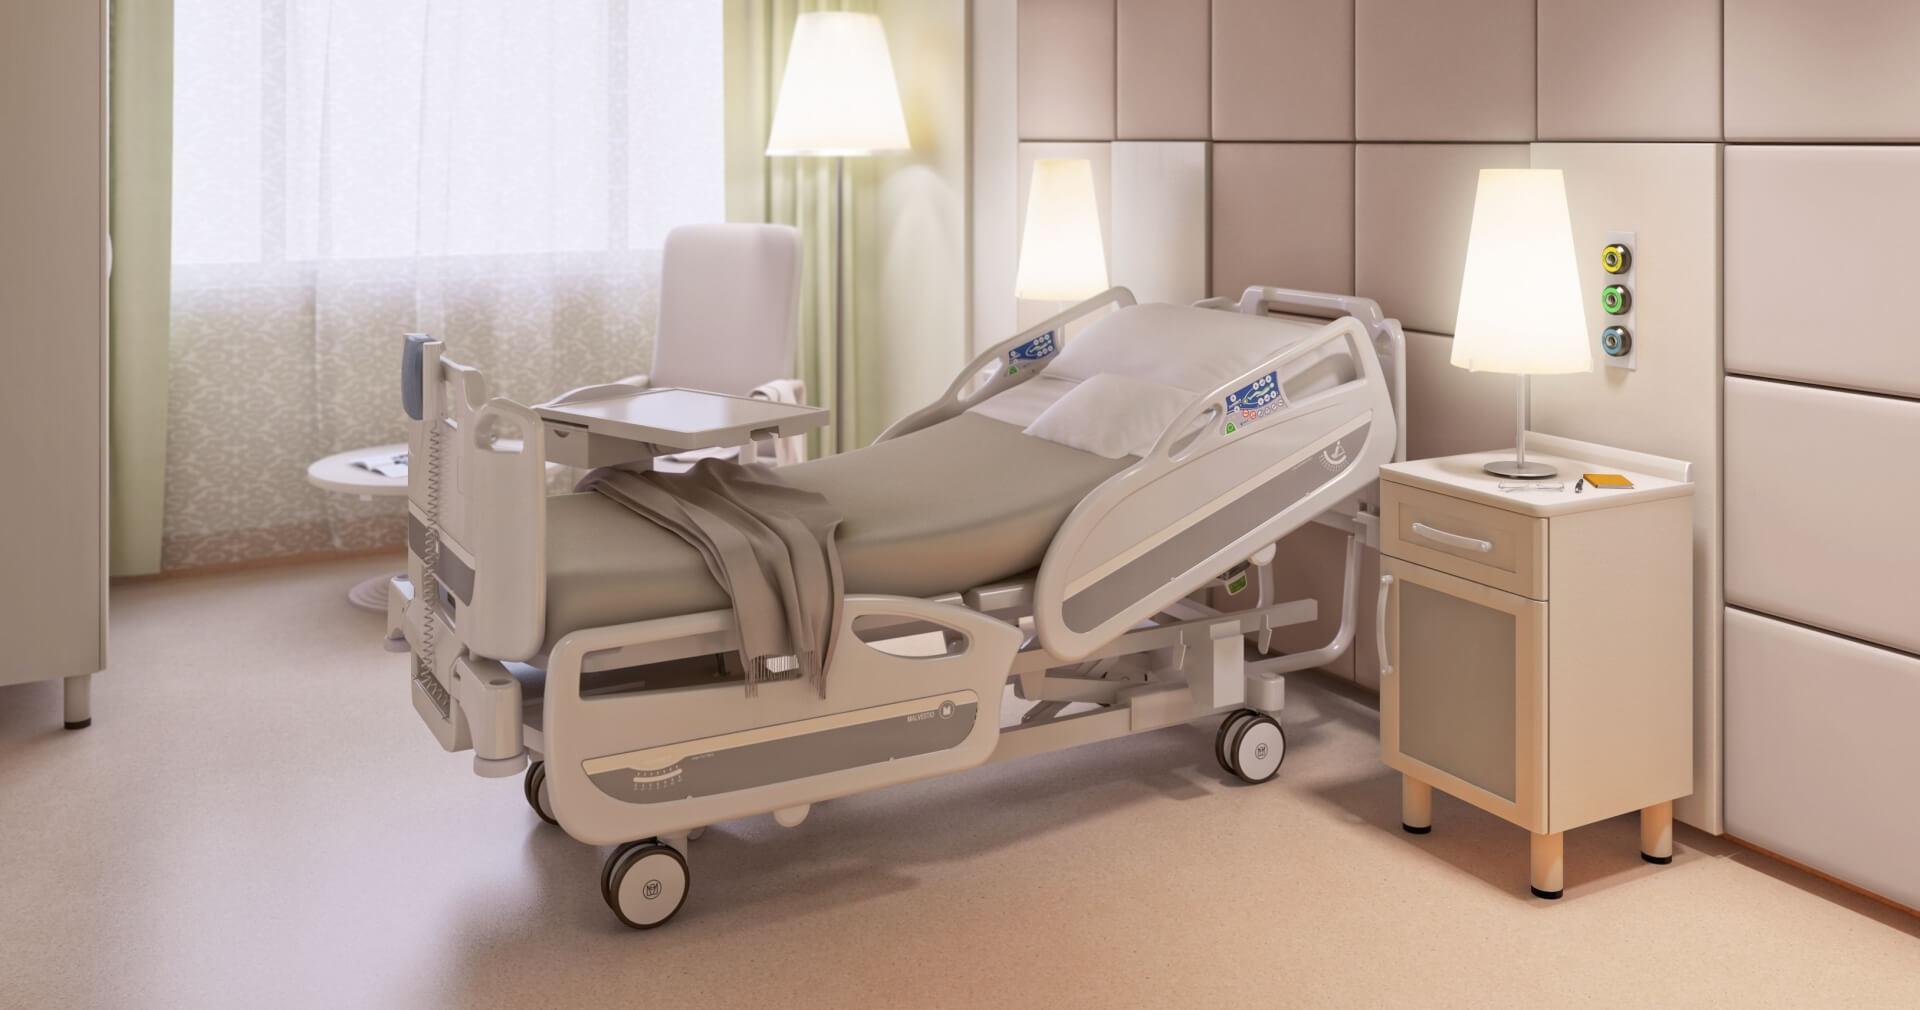 VIEN TREATMENT CENTER